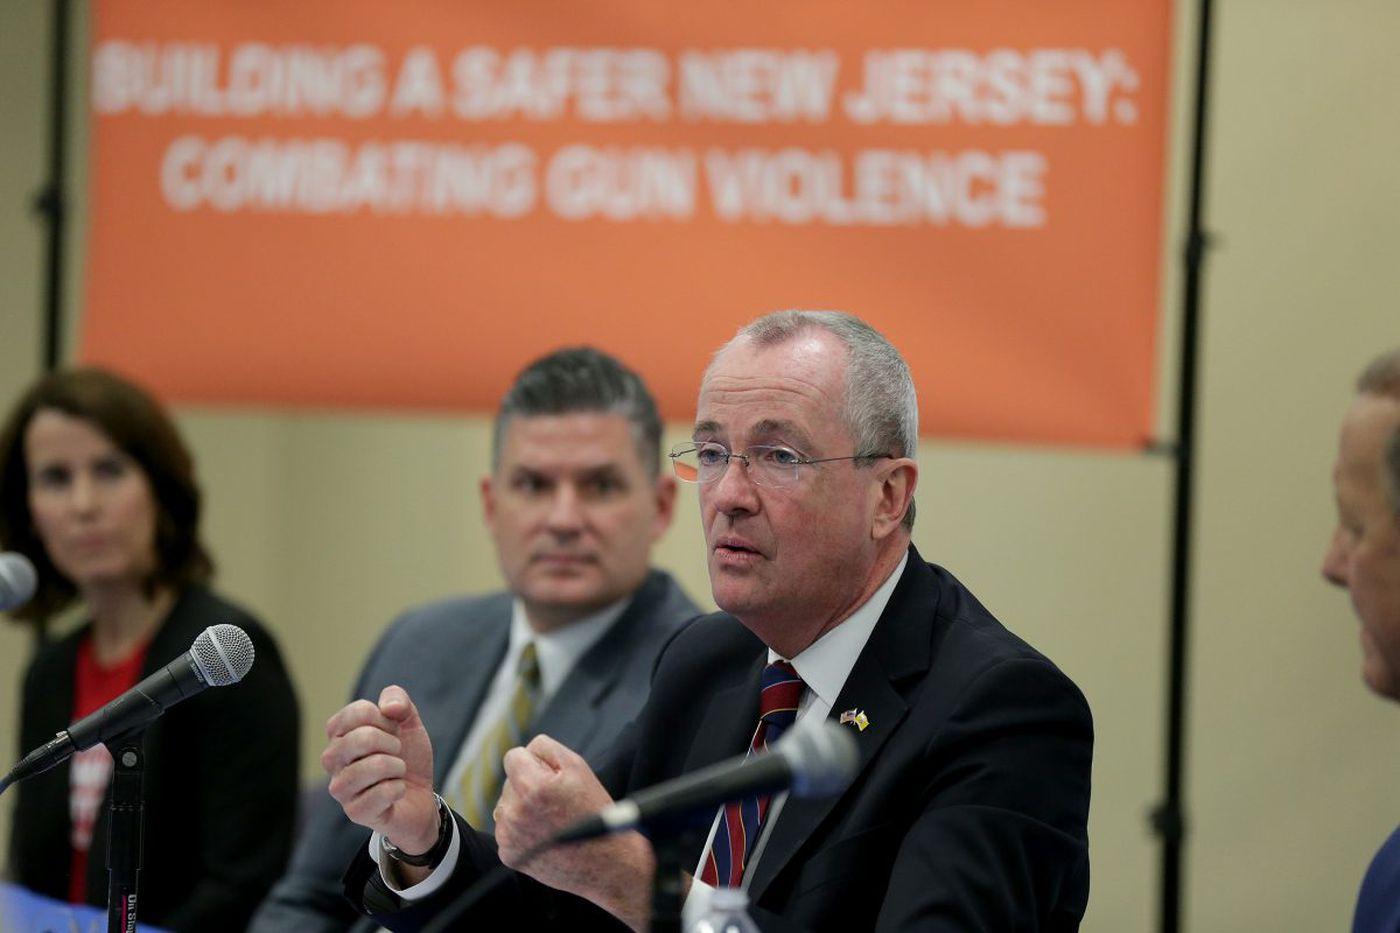 NJ Gov. Murphy doubles down on pledge to expand gun control